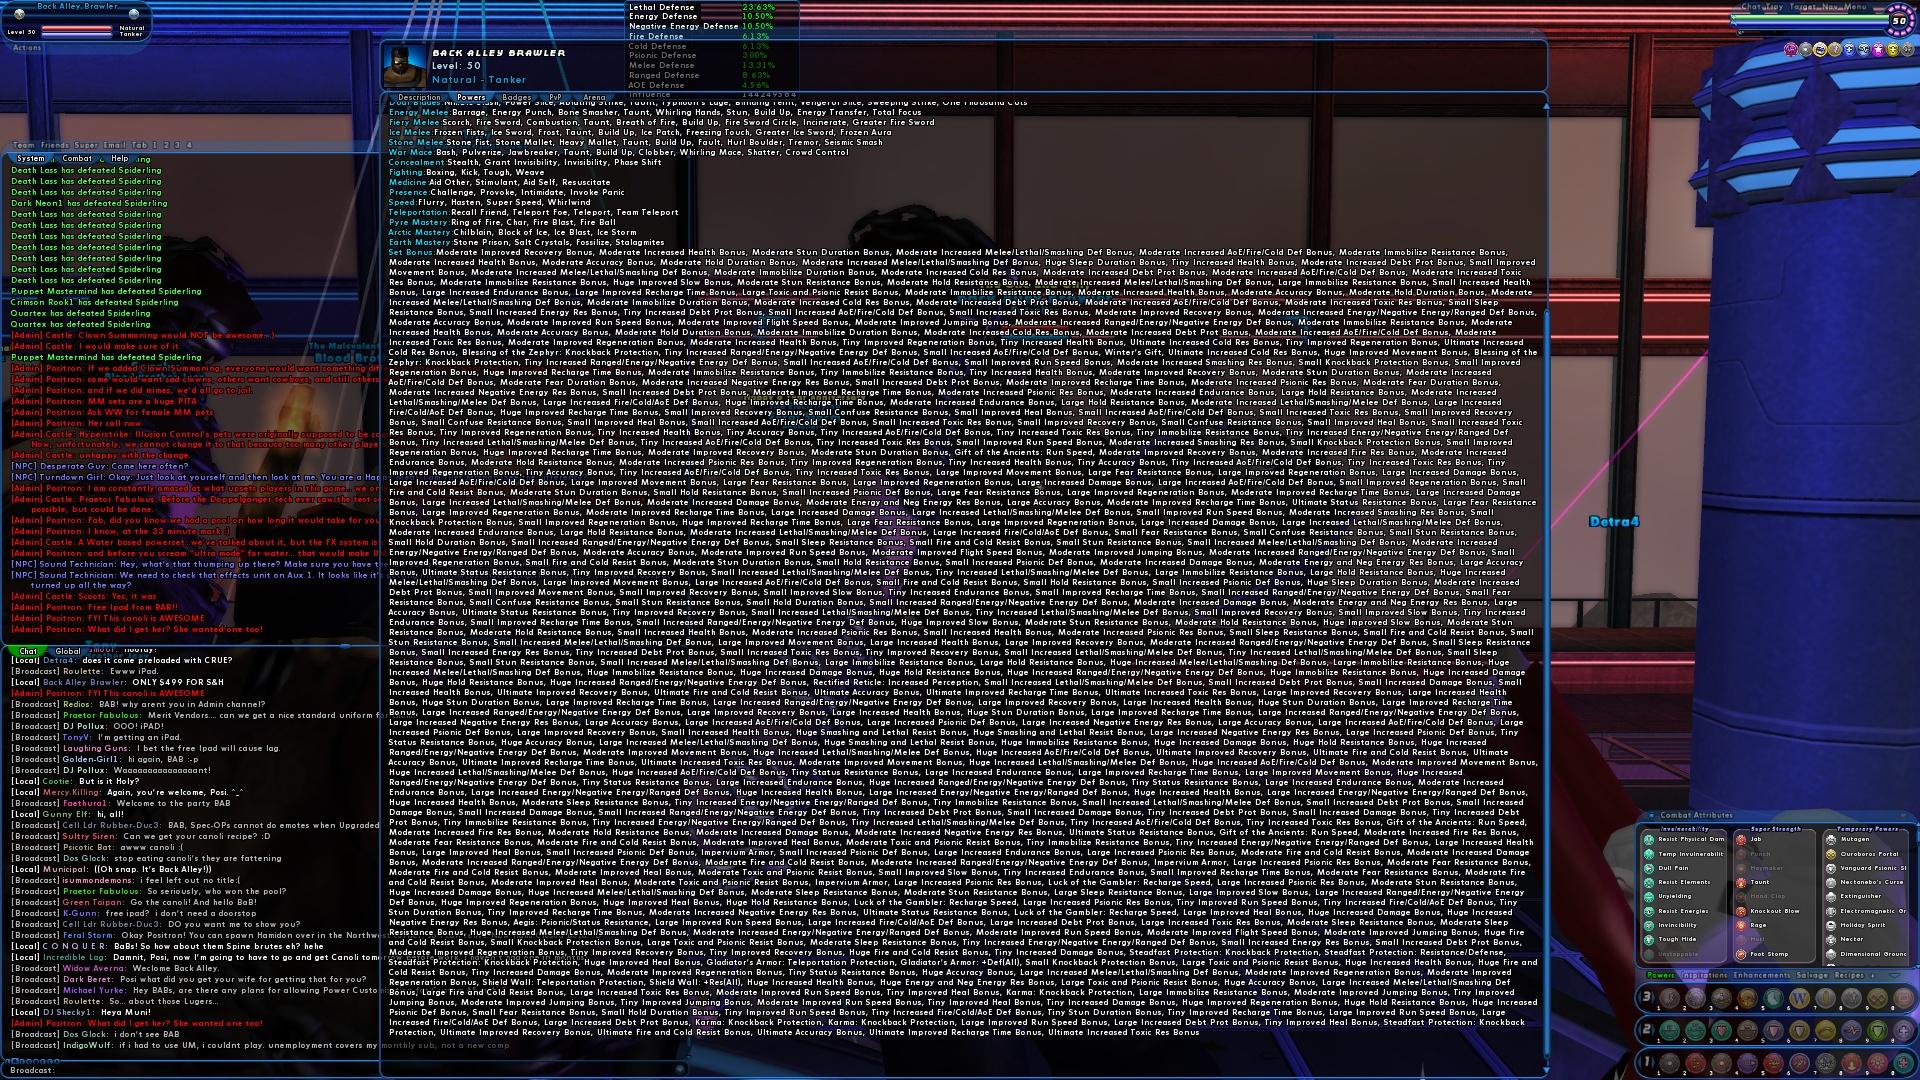 2010-04-28 19:56:52